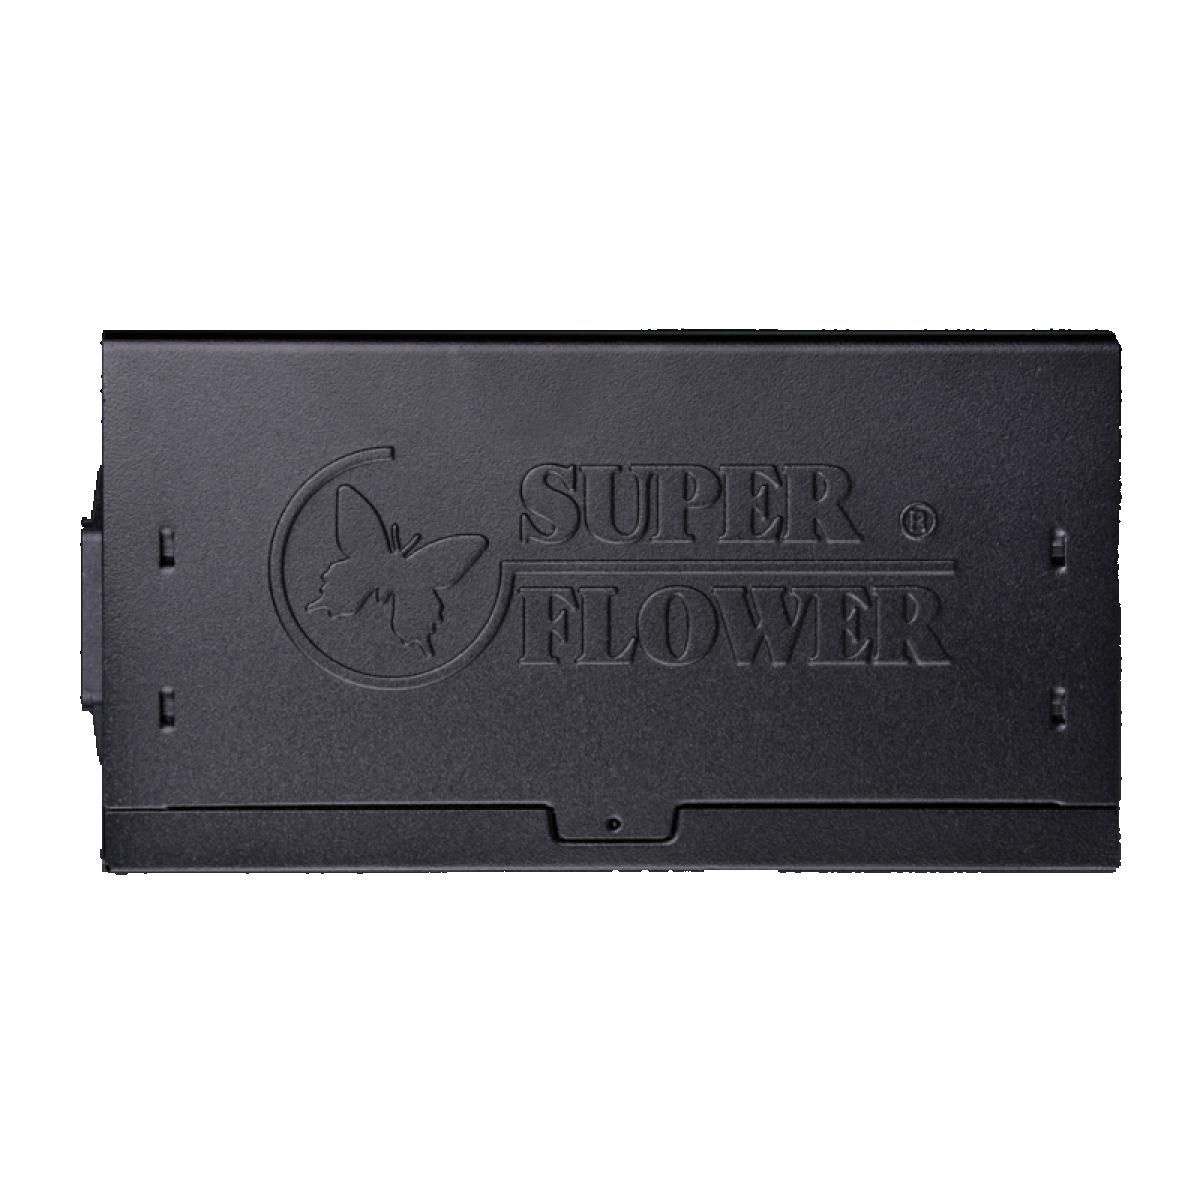 Fonte Super Flower LEADEX III 750W, 80 Plus Gold, PFC Ativo, Full Modular, SF-750F14HG